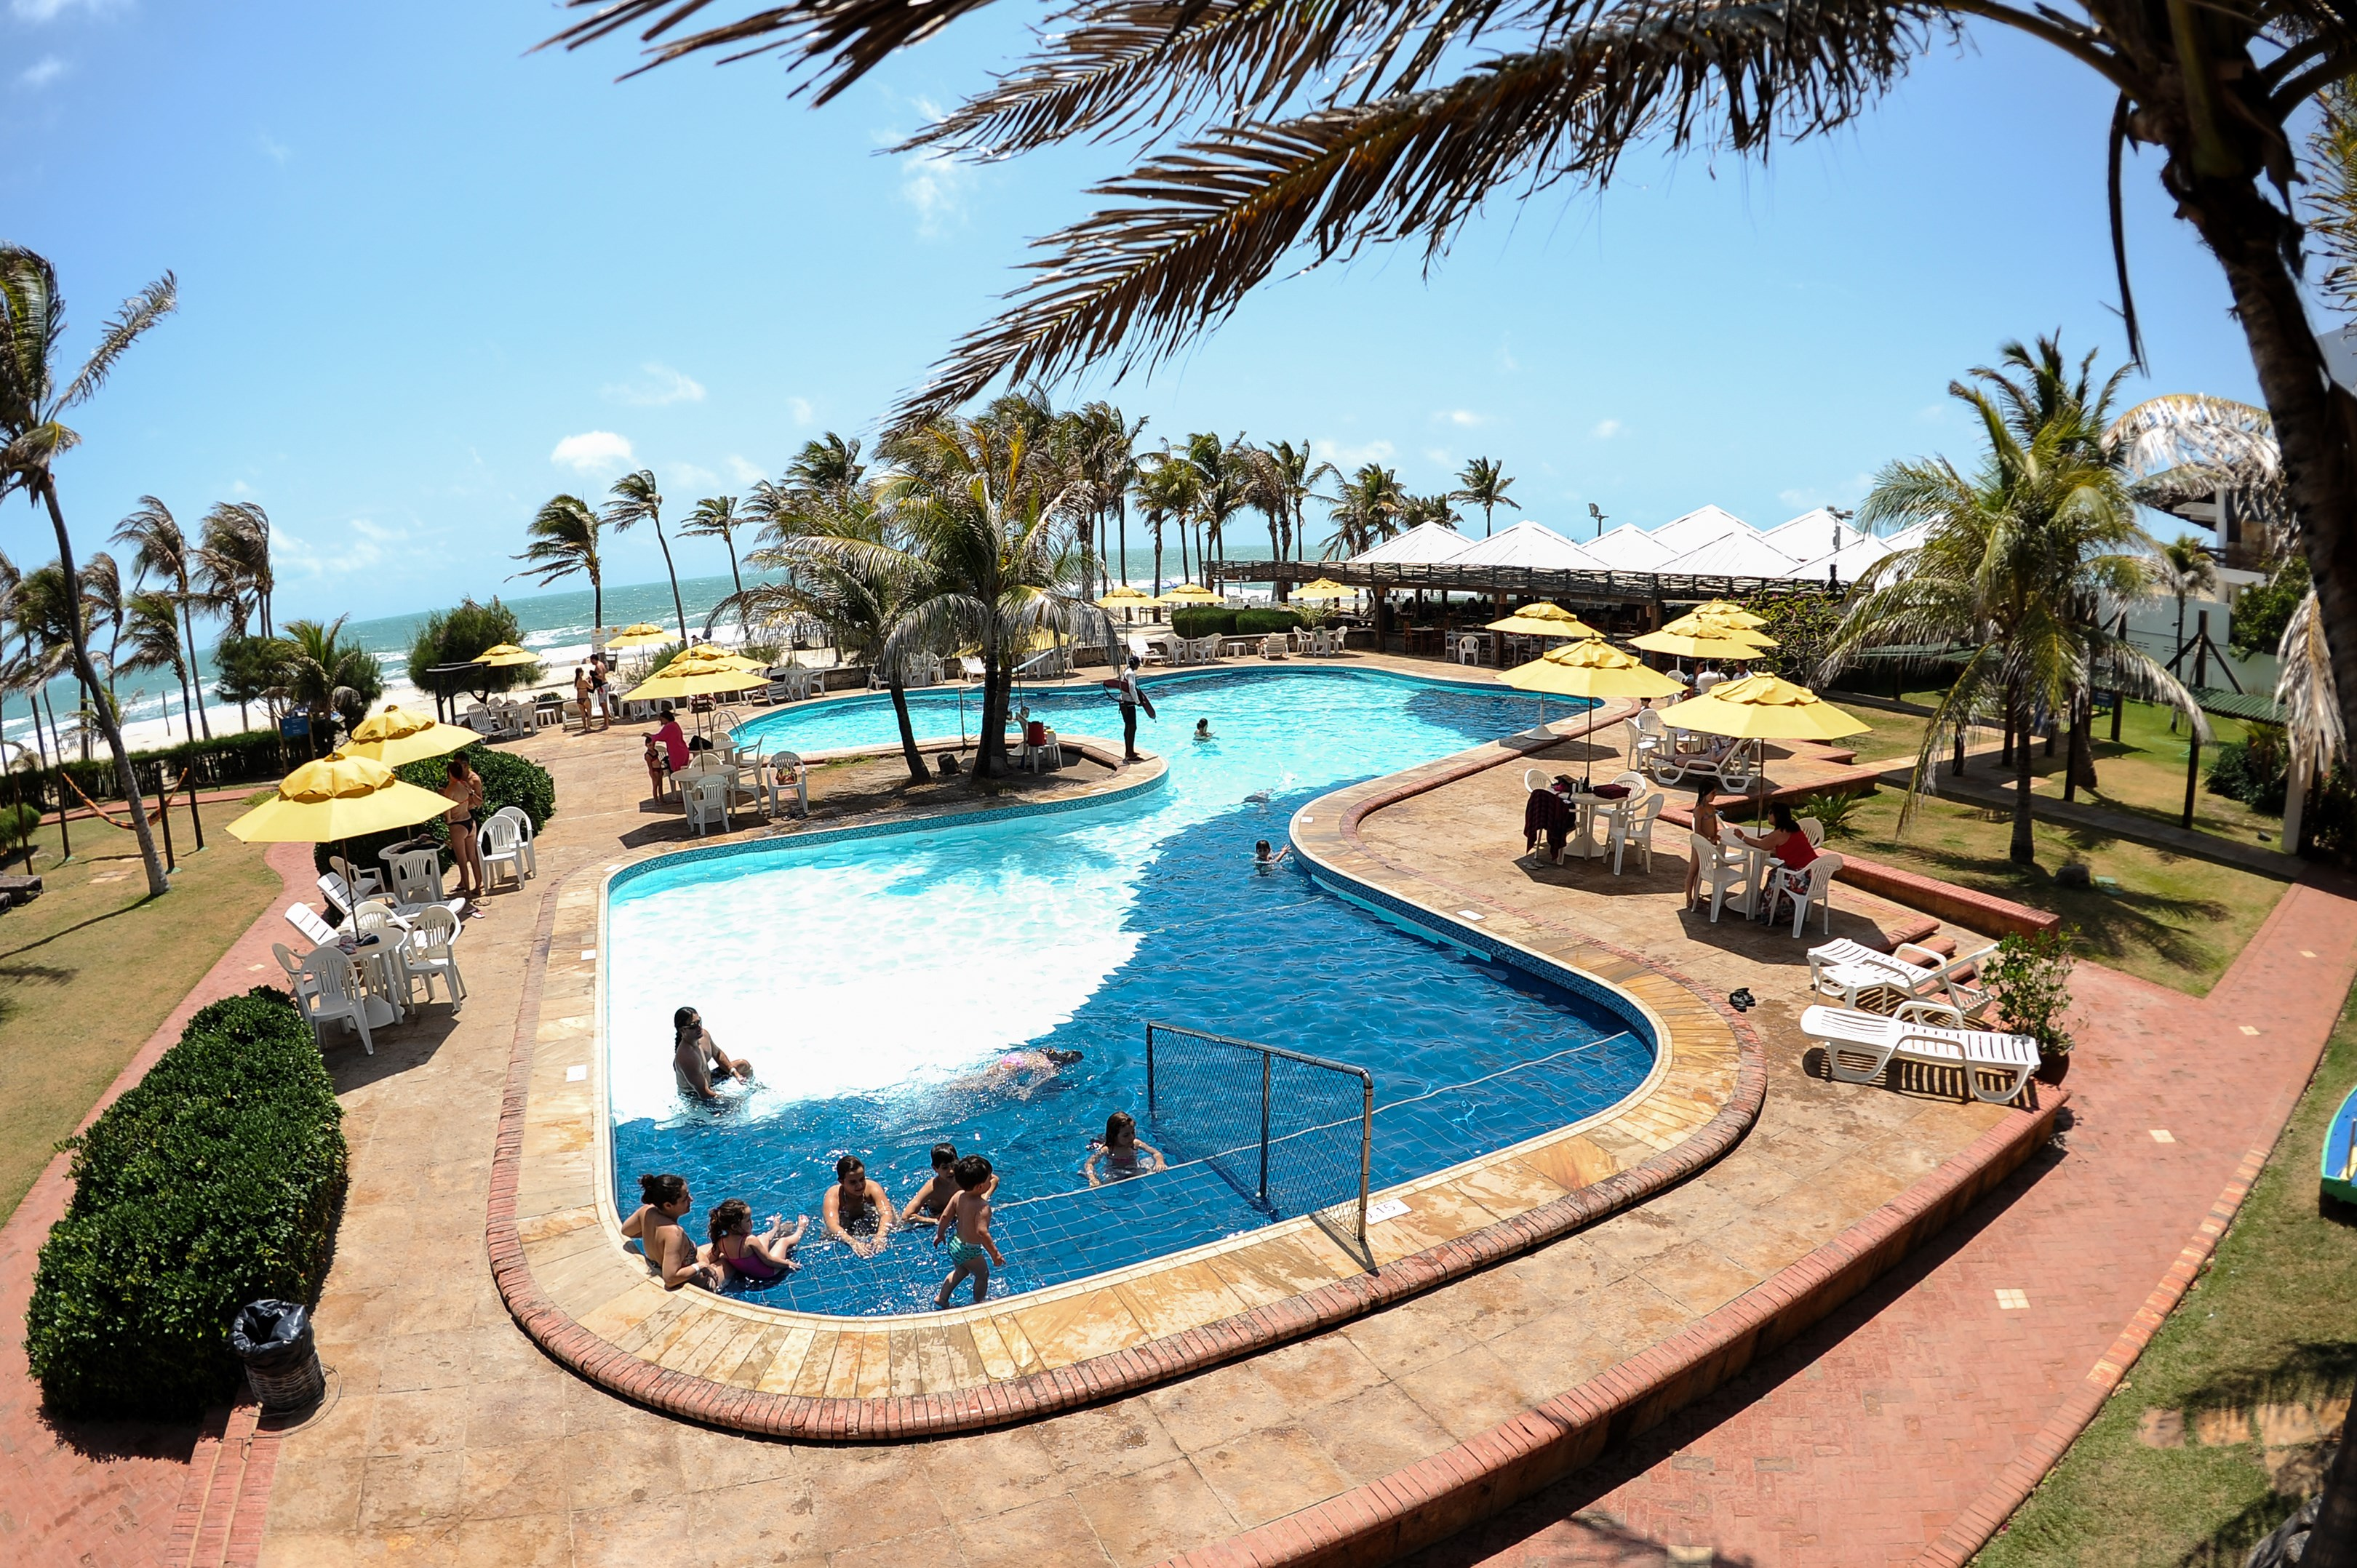 Hotel International Beach Caorle Hotelbewertung